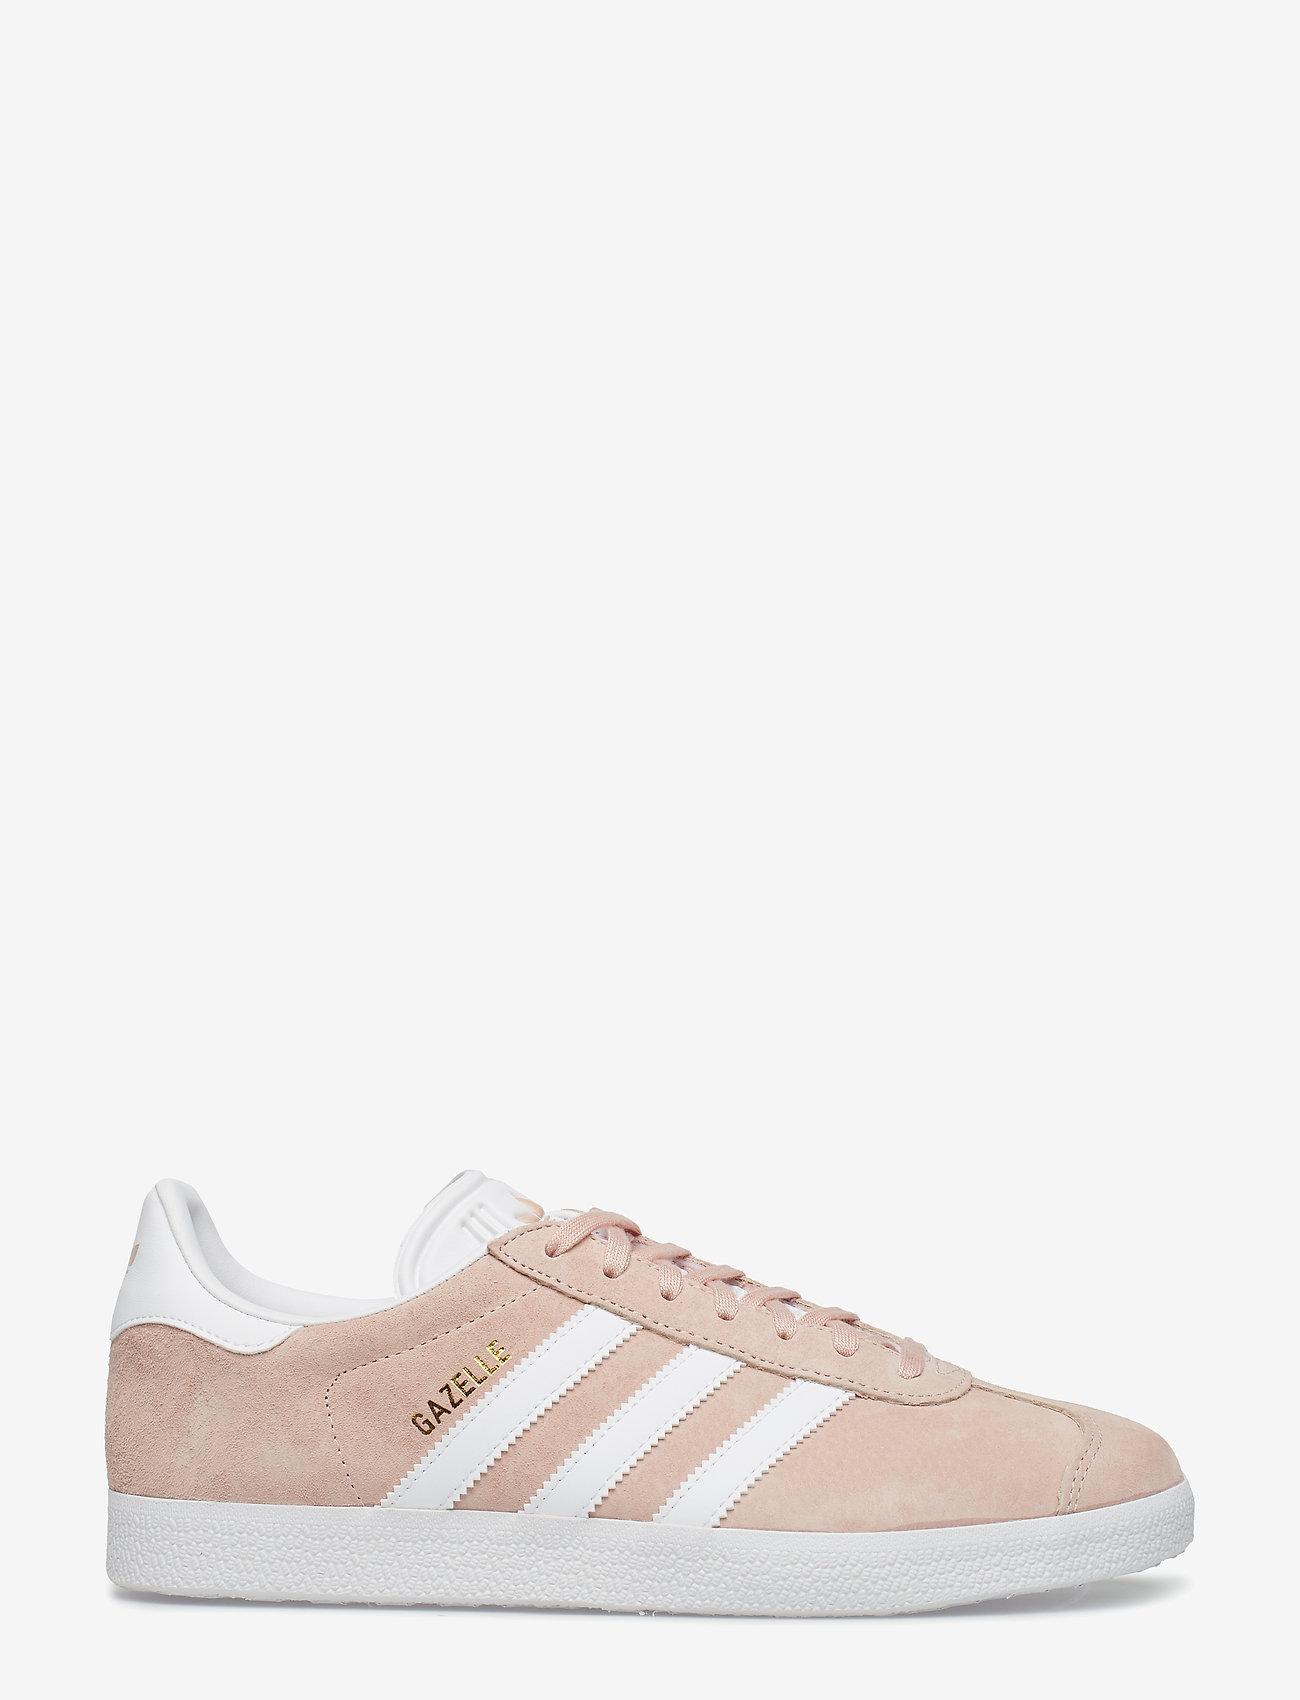 adidas Originals - Gazelle - lav ankel - vappnk/white/goldmt - 1